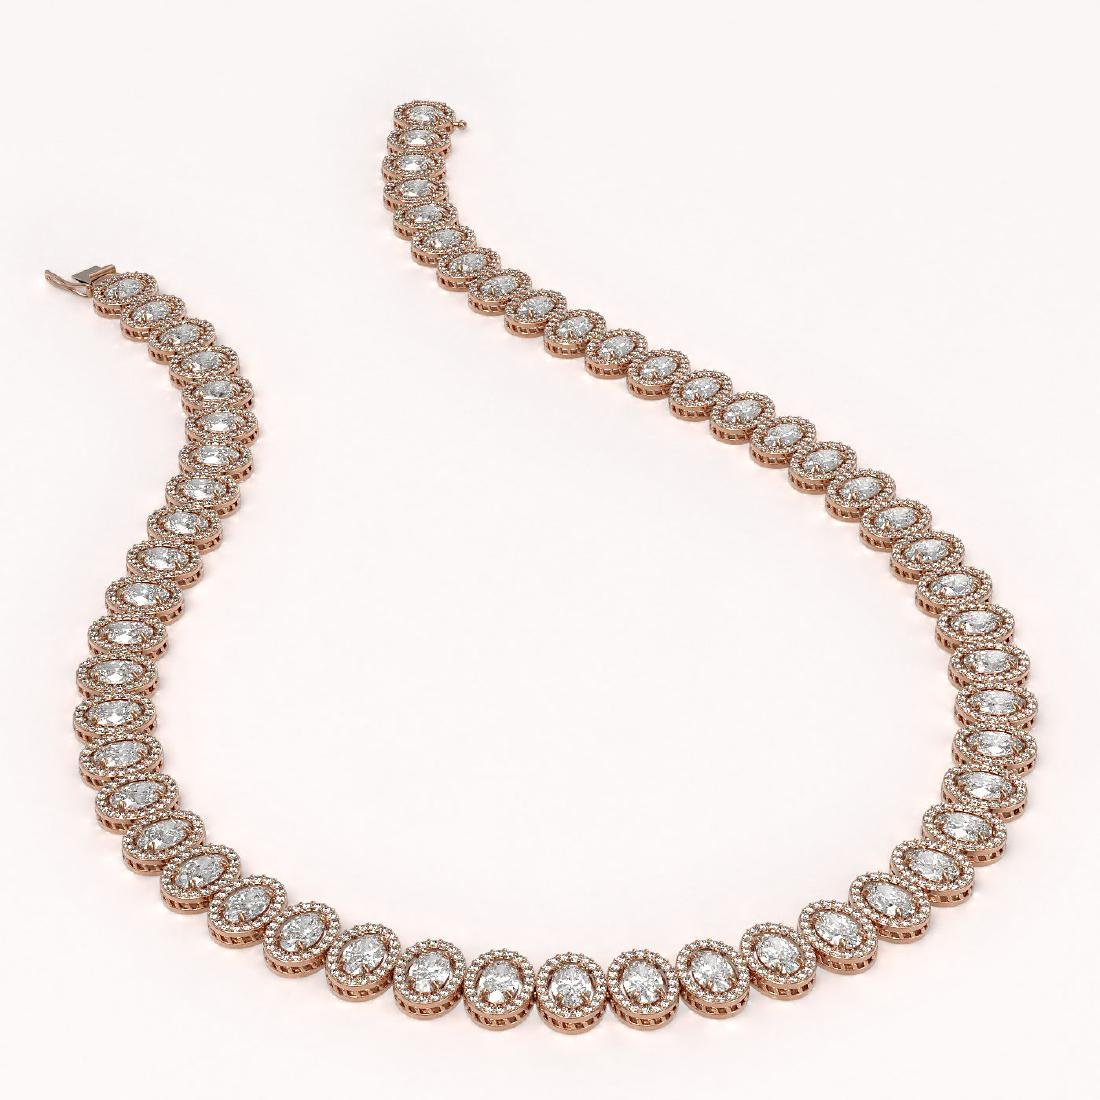 42.56 CTW Oval Diamond Designer Necklace 18K Rose Gold - 2